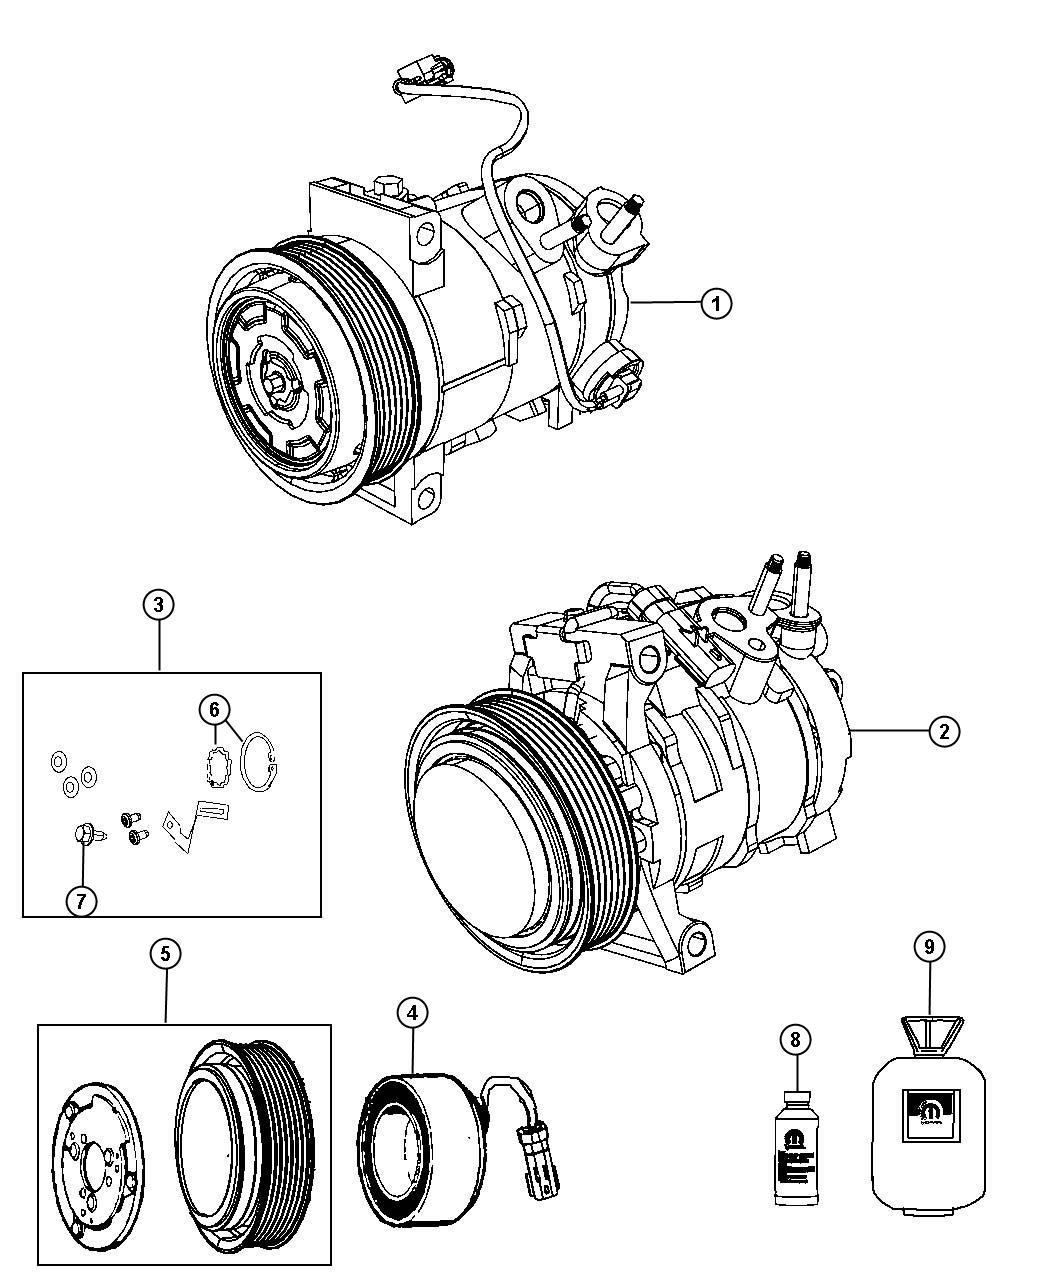 Jeep Compass Compressor Air Conditioning Control Conditioningair Auto